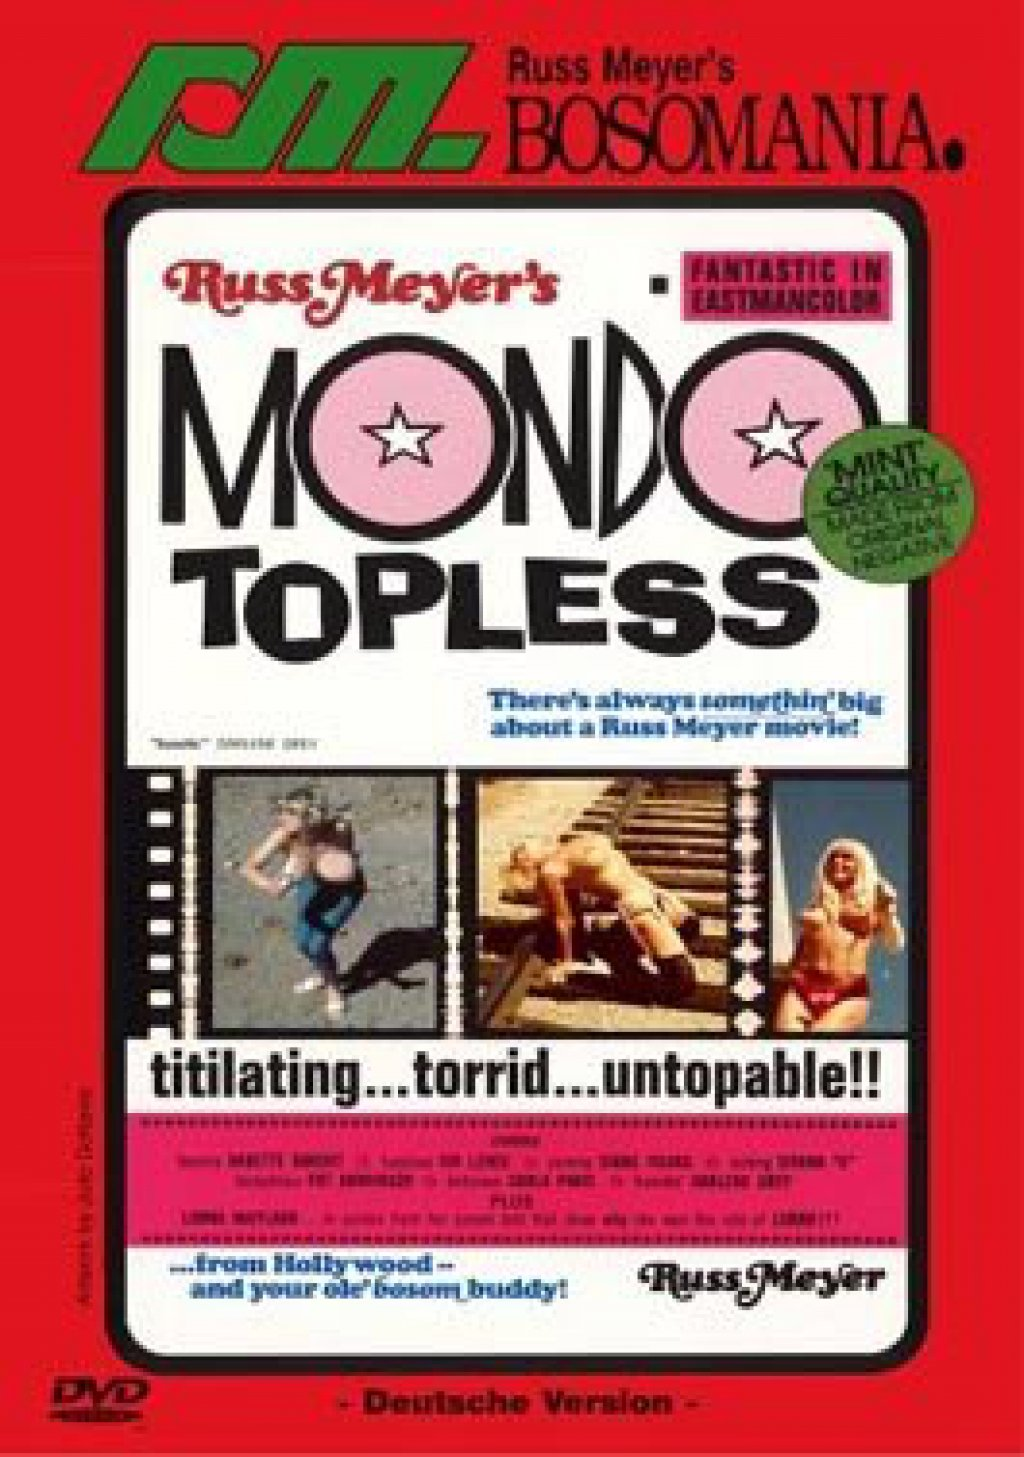 Russ Meyer's Bosomania - Mondo Topless (DVD)